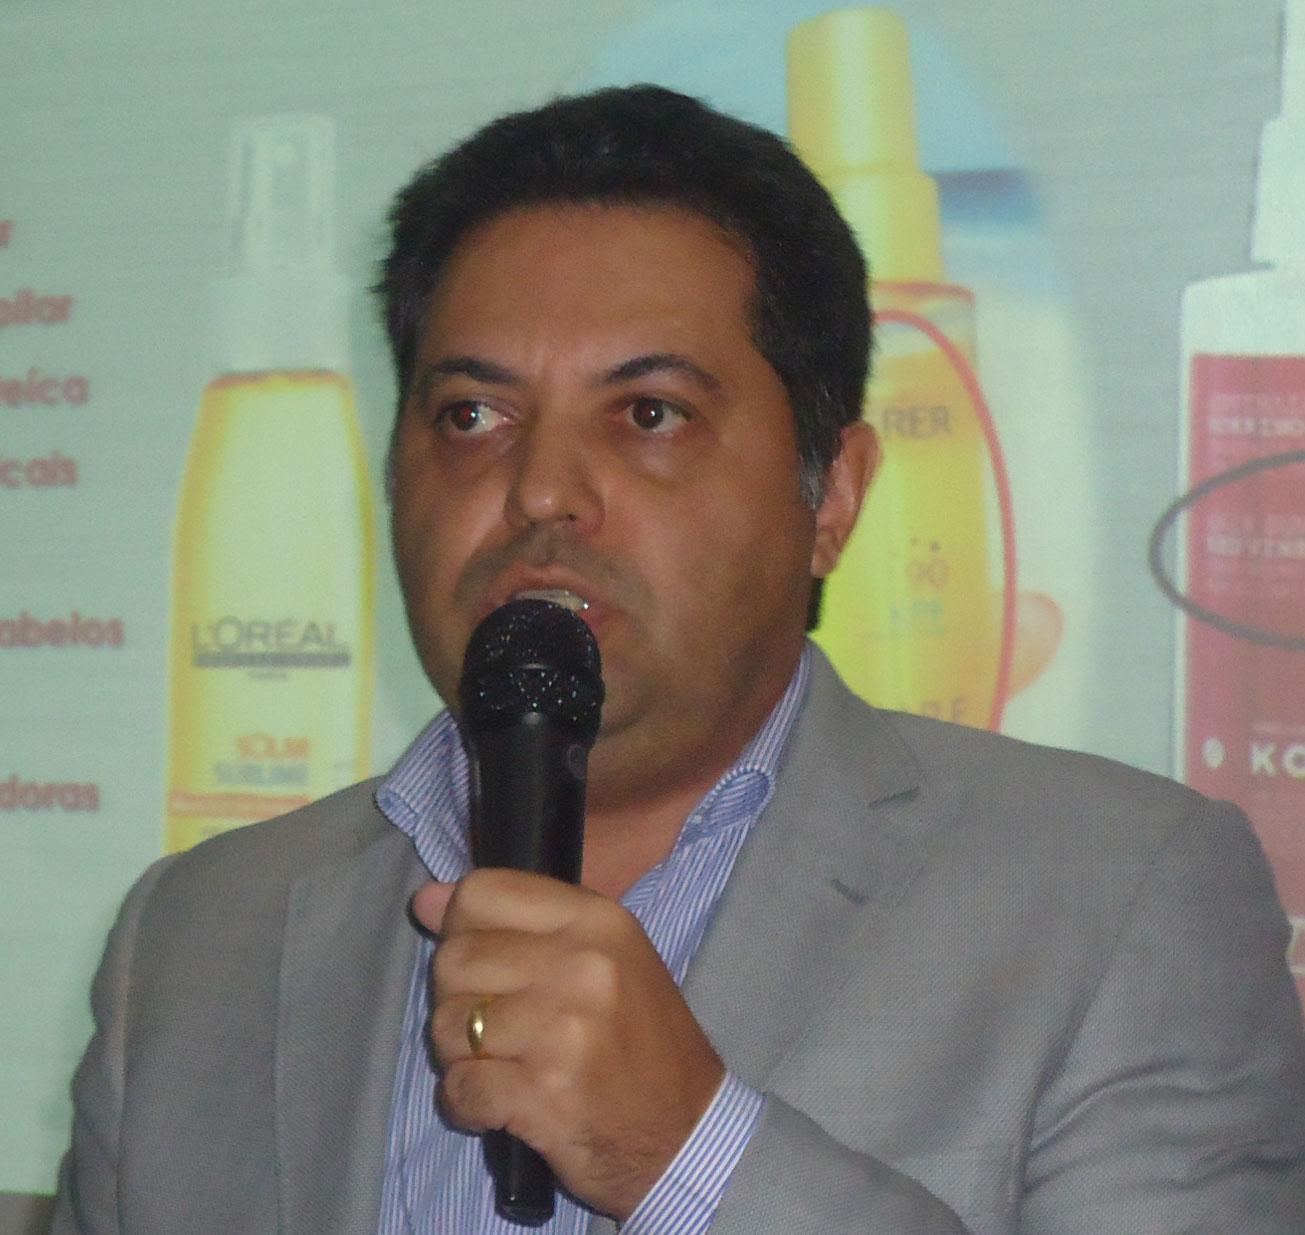 Adriano da Silva Pinheiro